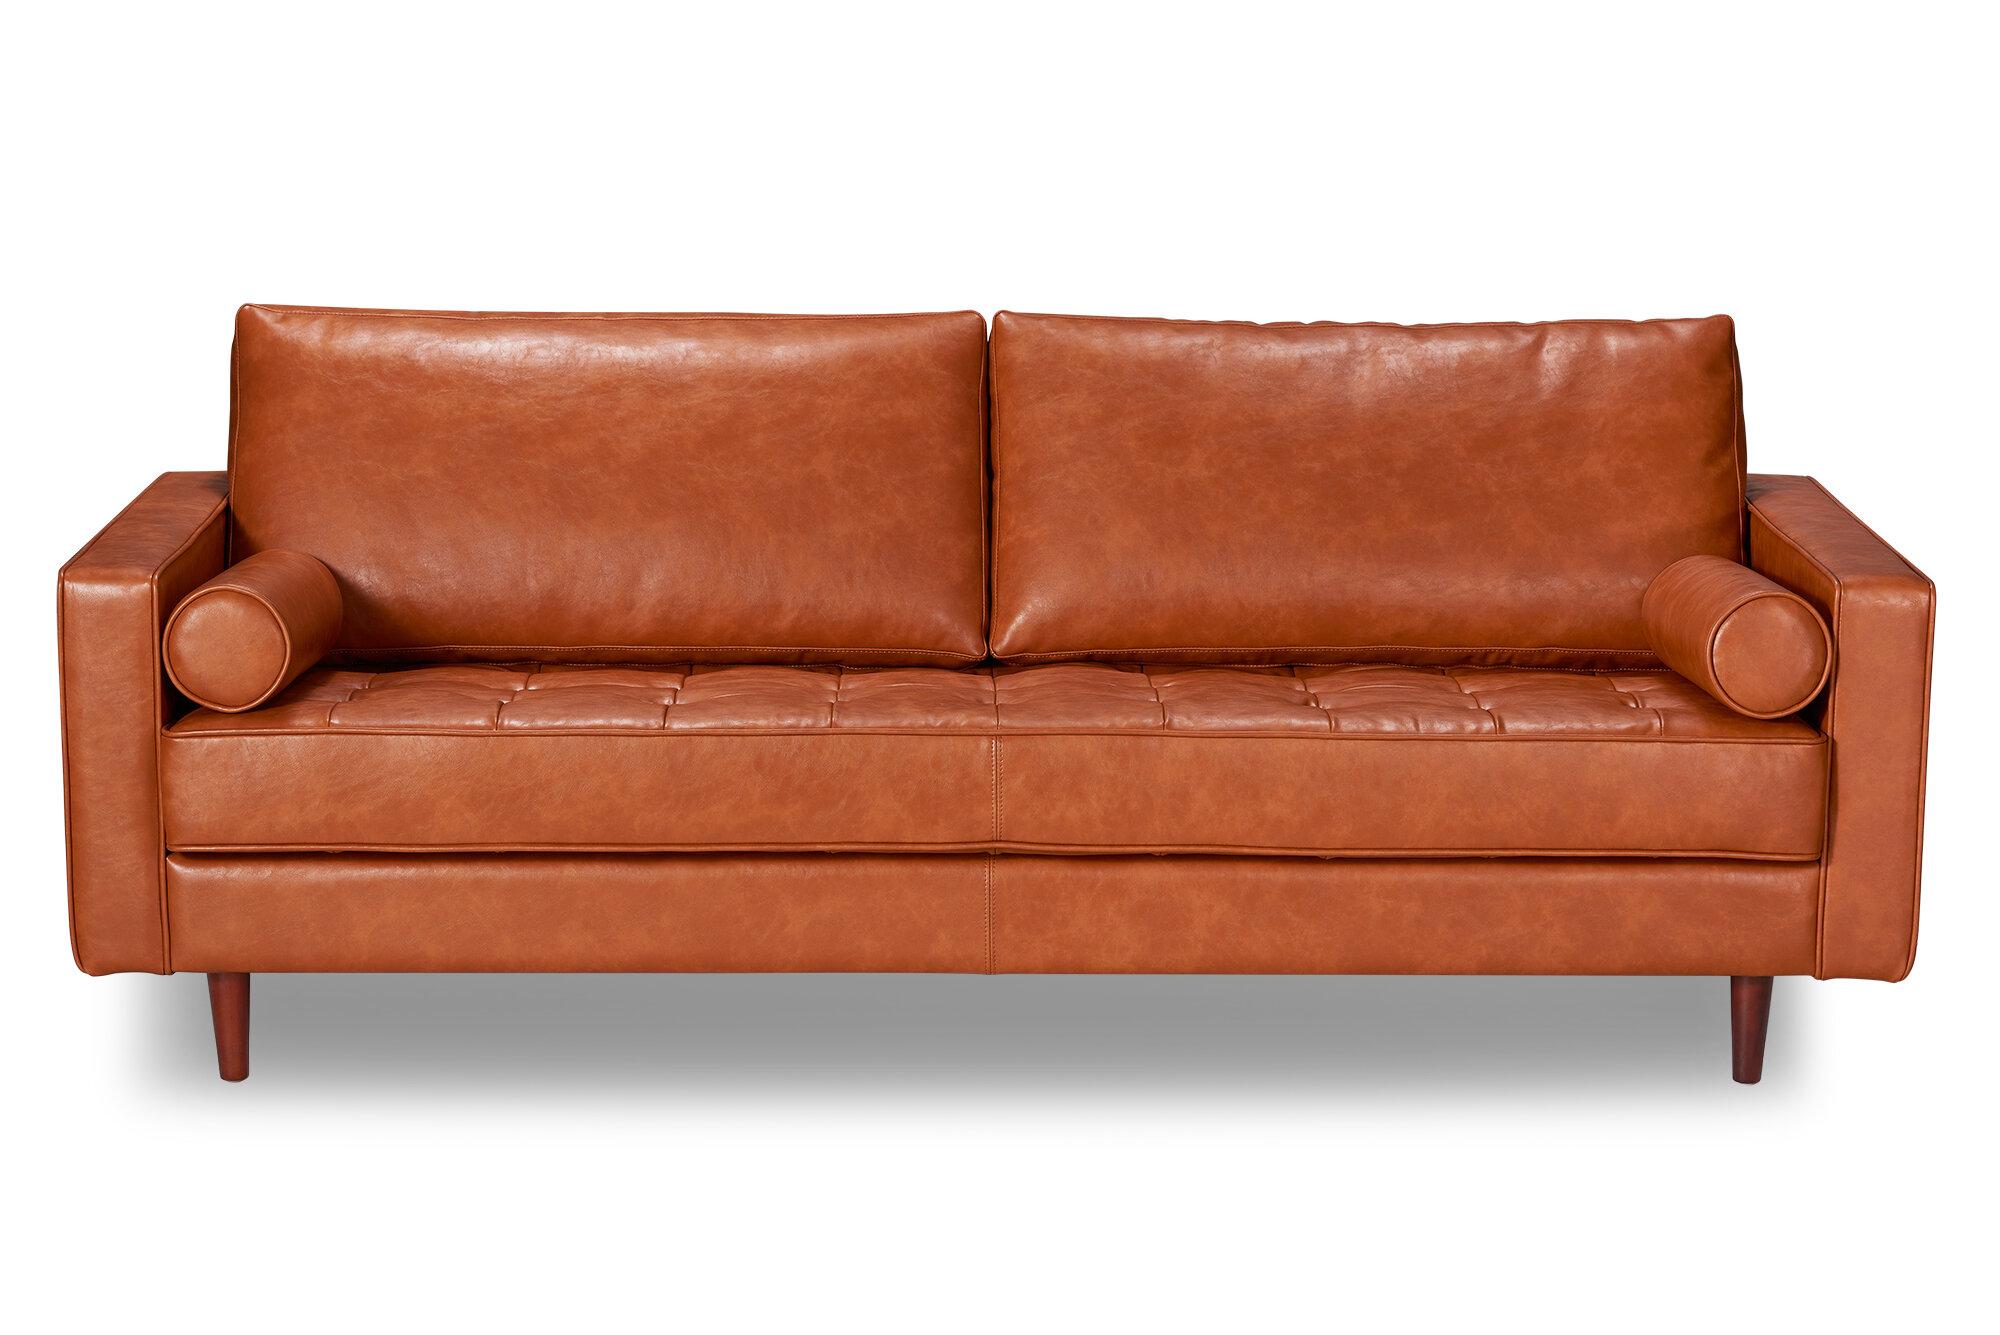 Bombay Leather Sofa & Reviews | AllModern